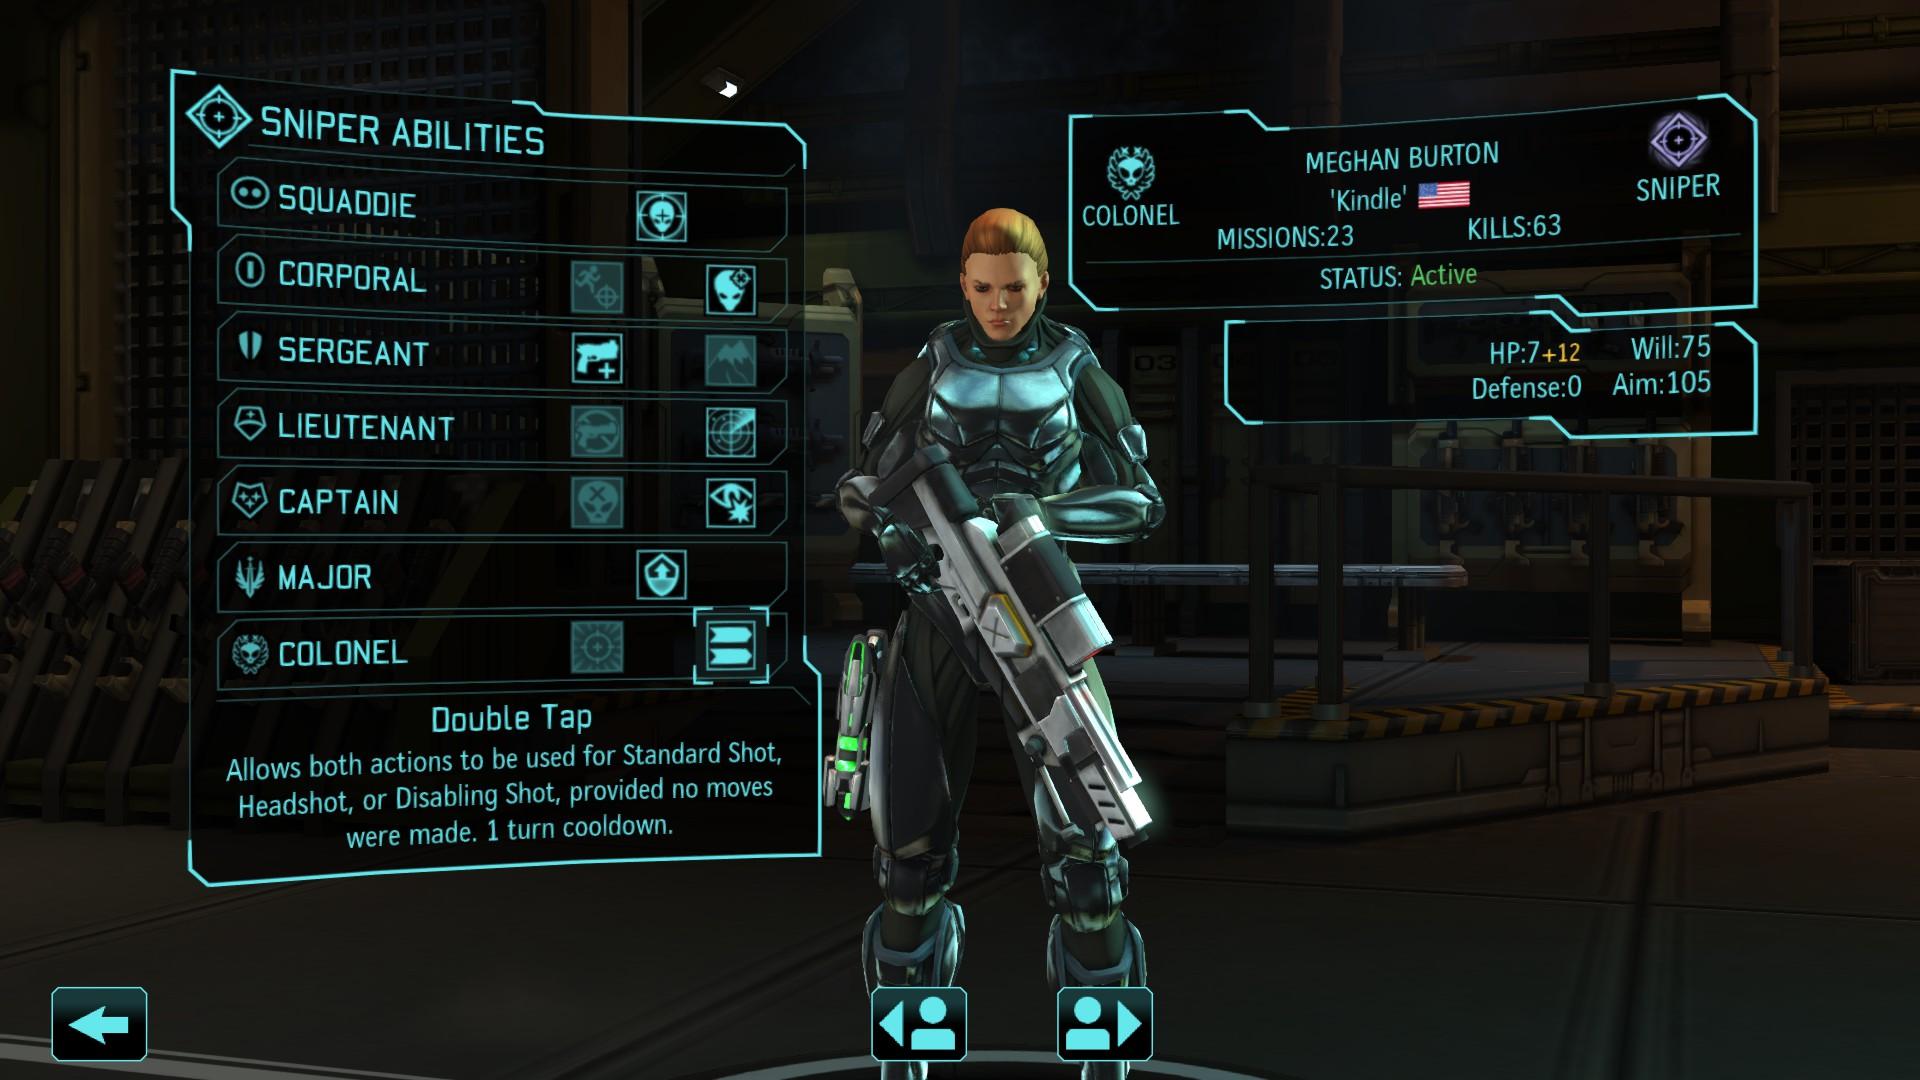 Читы для XCOM: Enemy Unknown - чит коды, nocd, nodvd